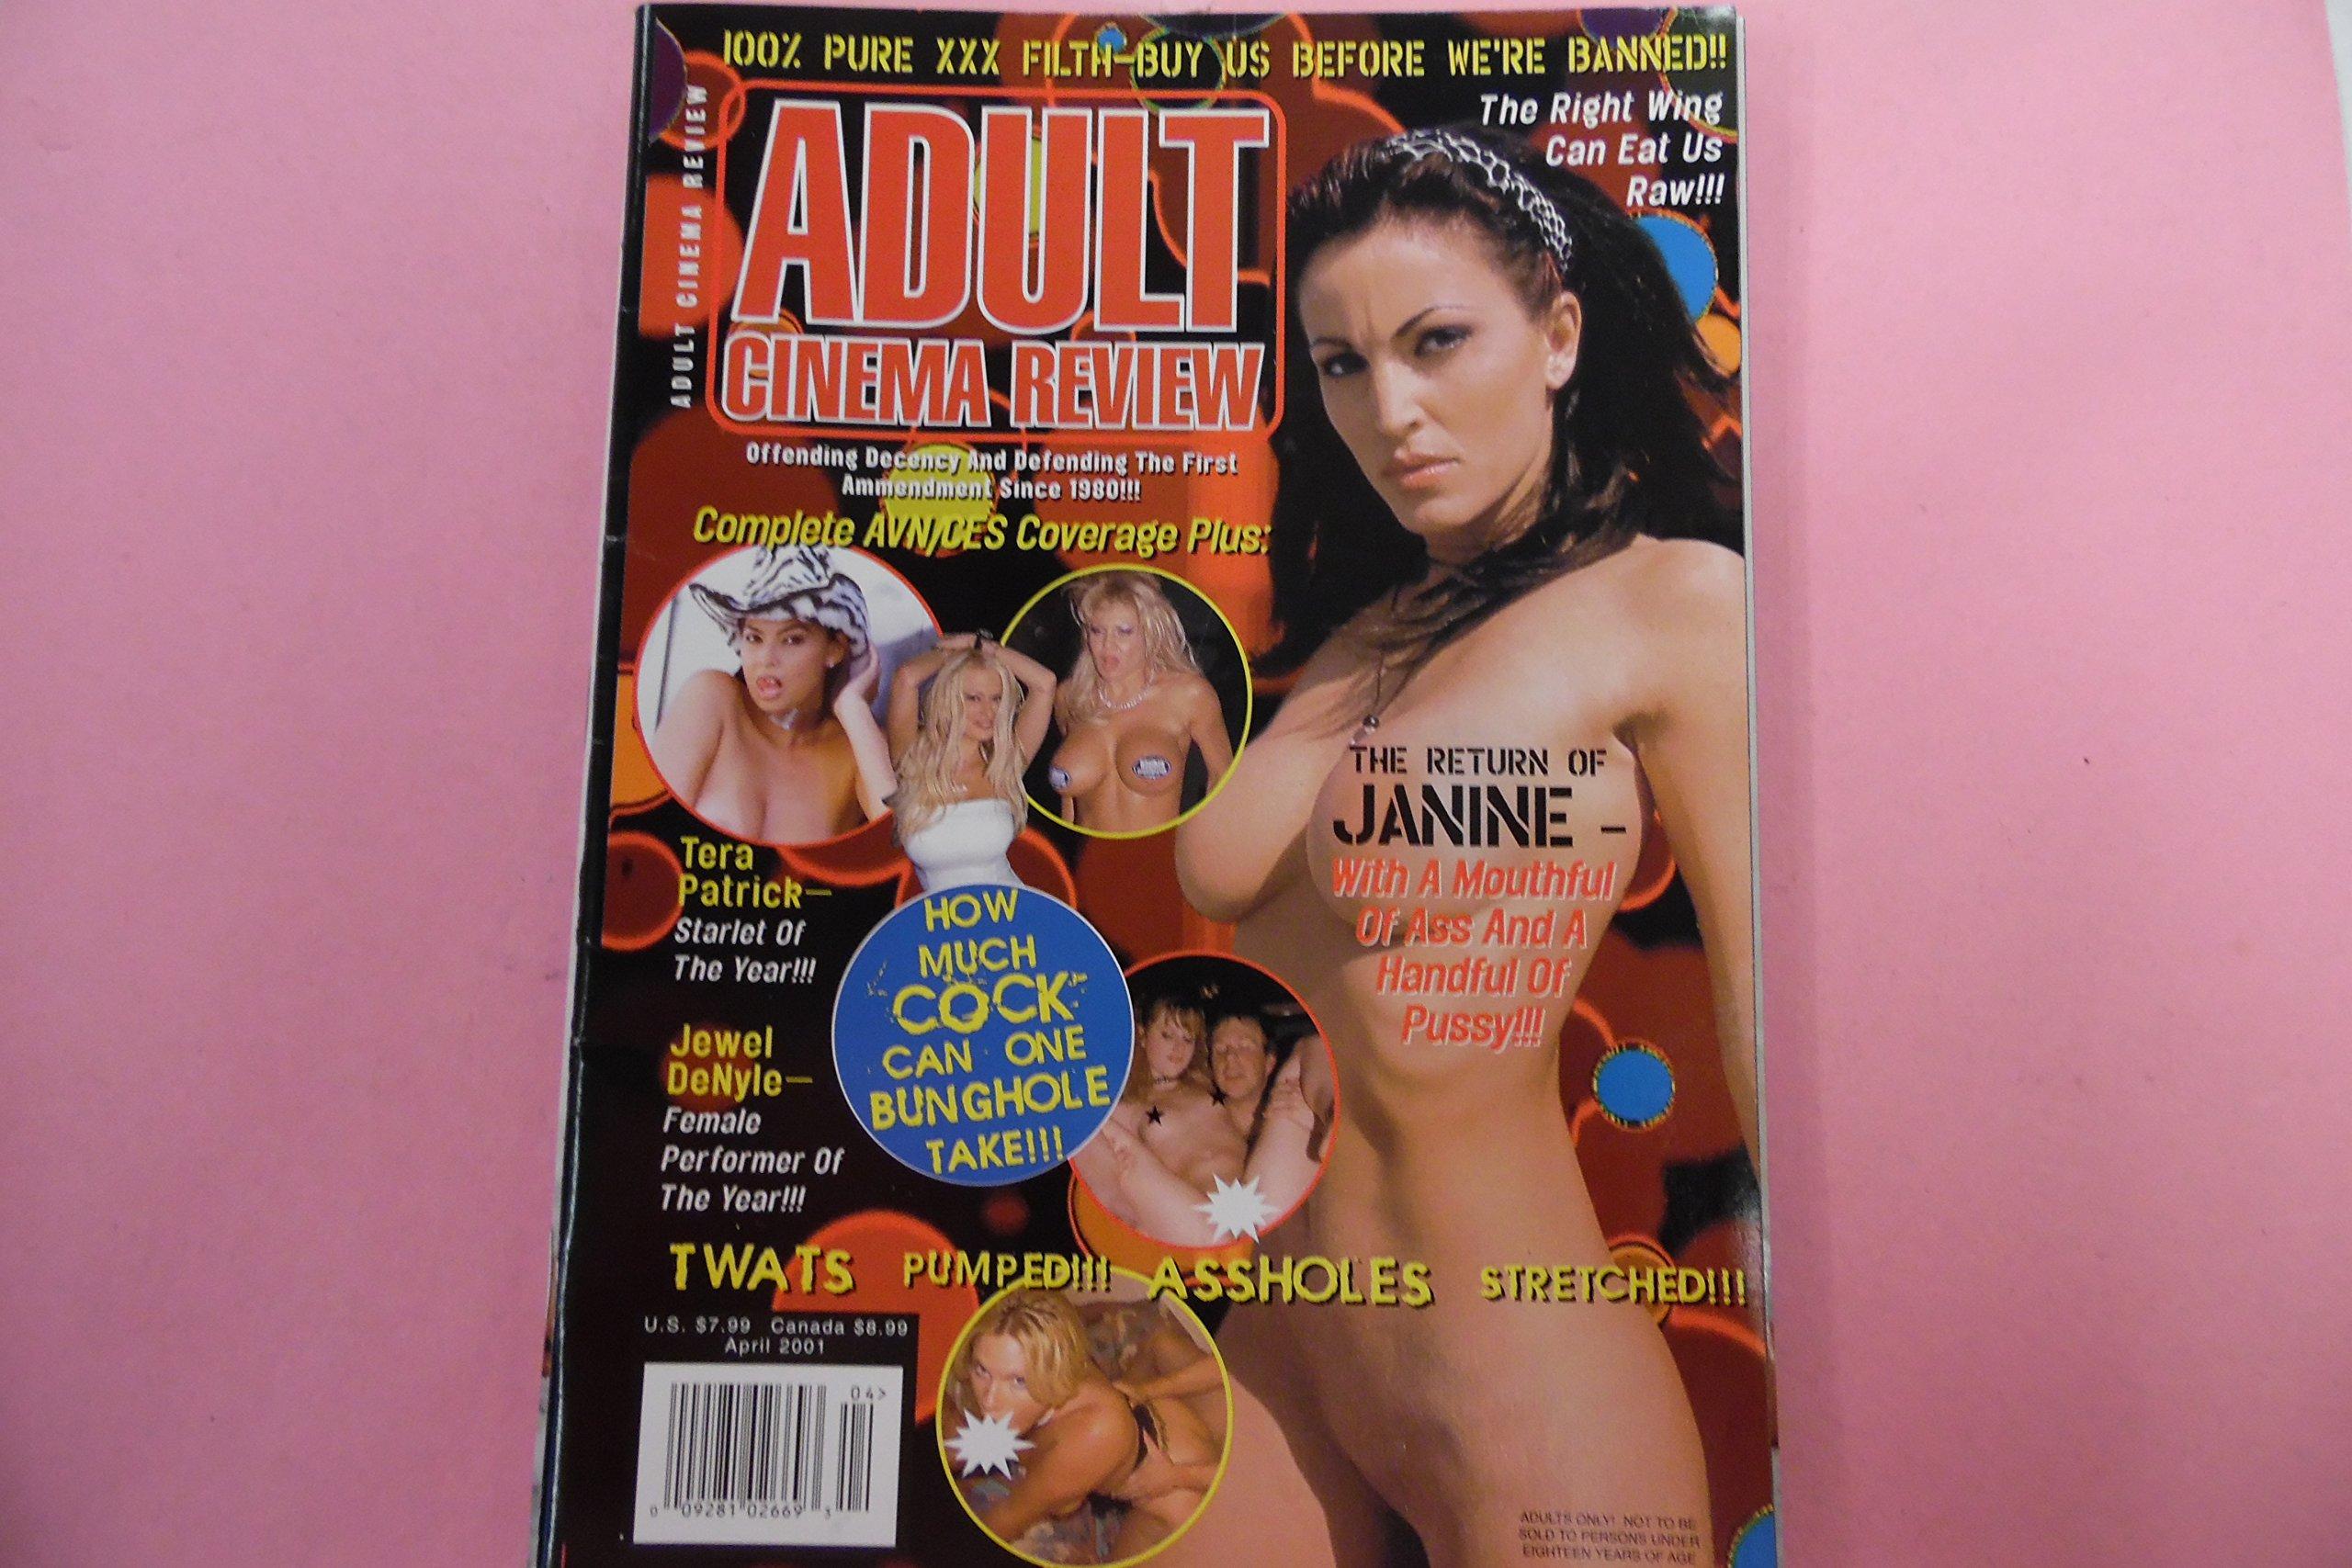 Adult Cinema Review Magazine Janine Tera Patrick Jewel Denyle April 2001 Acr Amazon Com Books